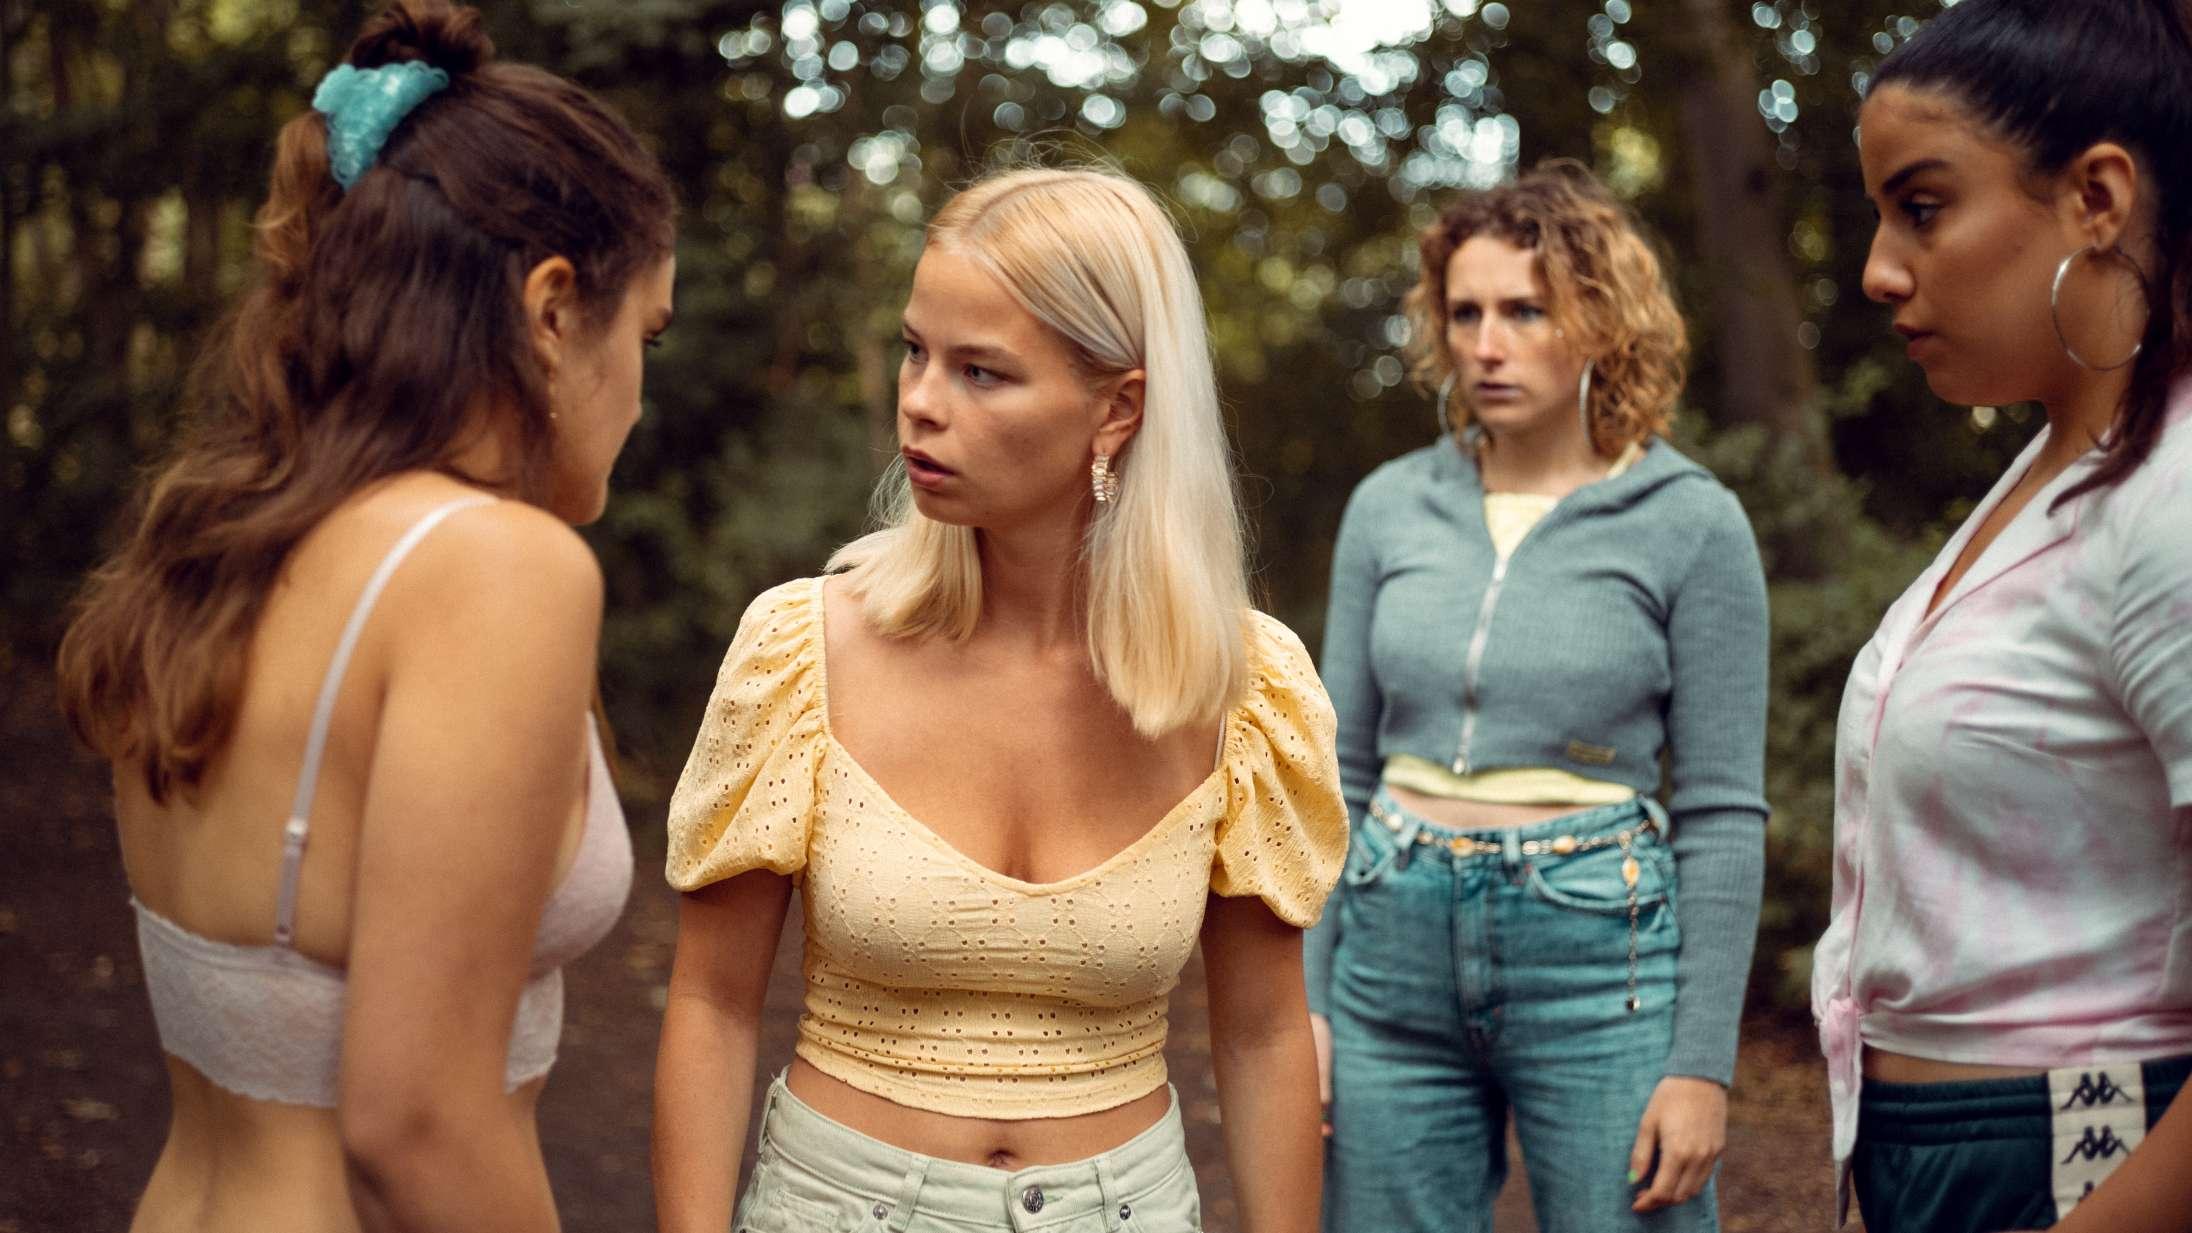 Vi anmelder de nye afgangsfilm fra Super16: Gevaldige twists, eminente billedmagere, turbulente teenagesjæle